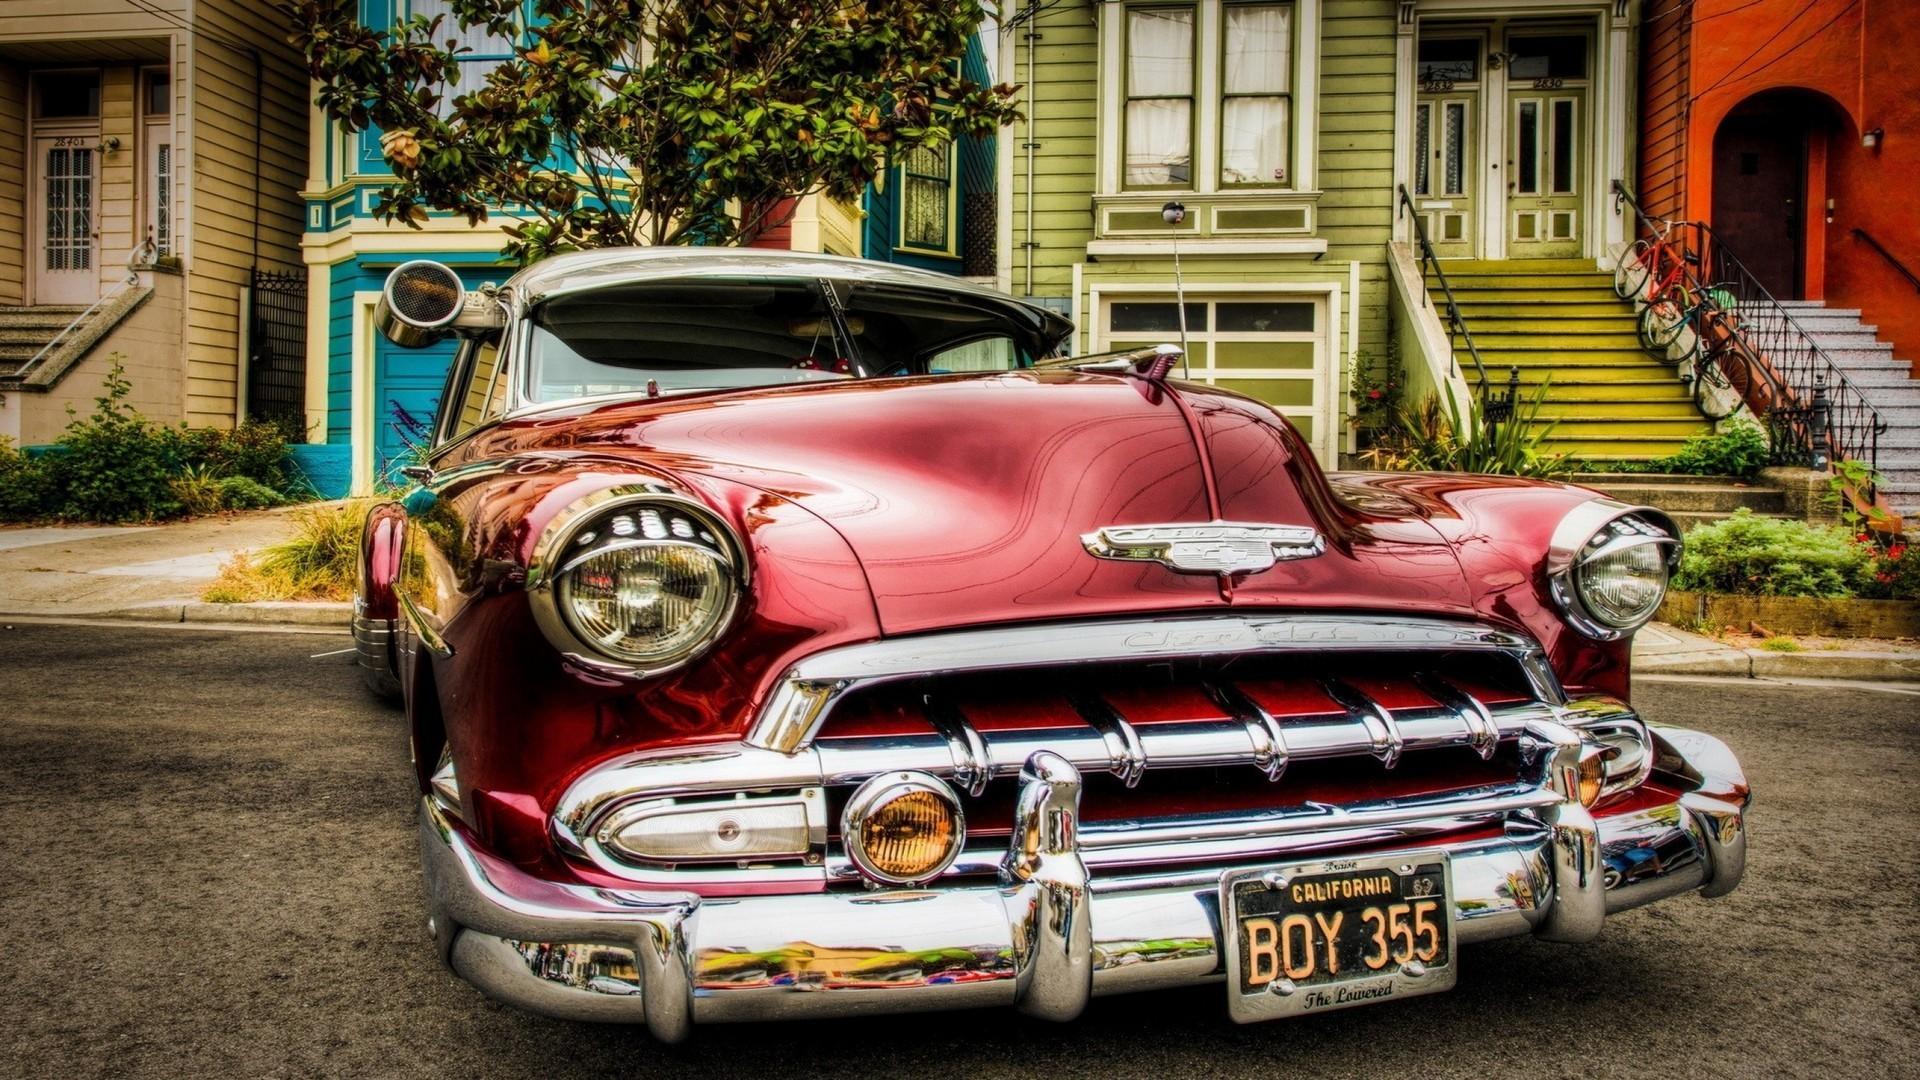 Wallpaper Trees Urban House Red Cars Vintage Vintage Car